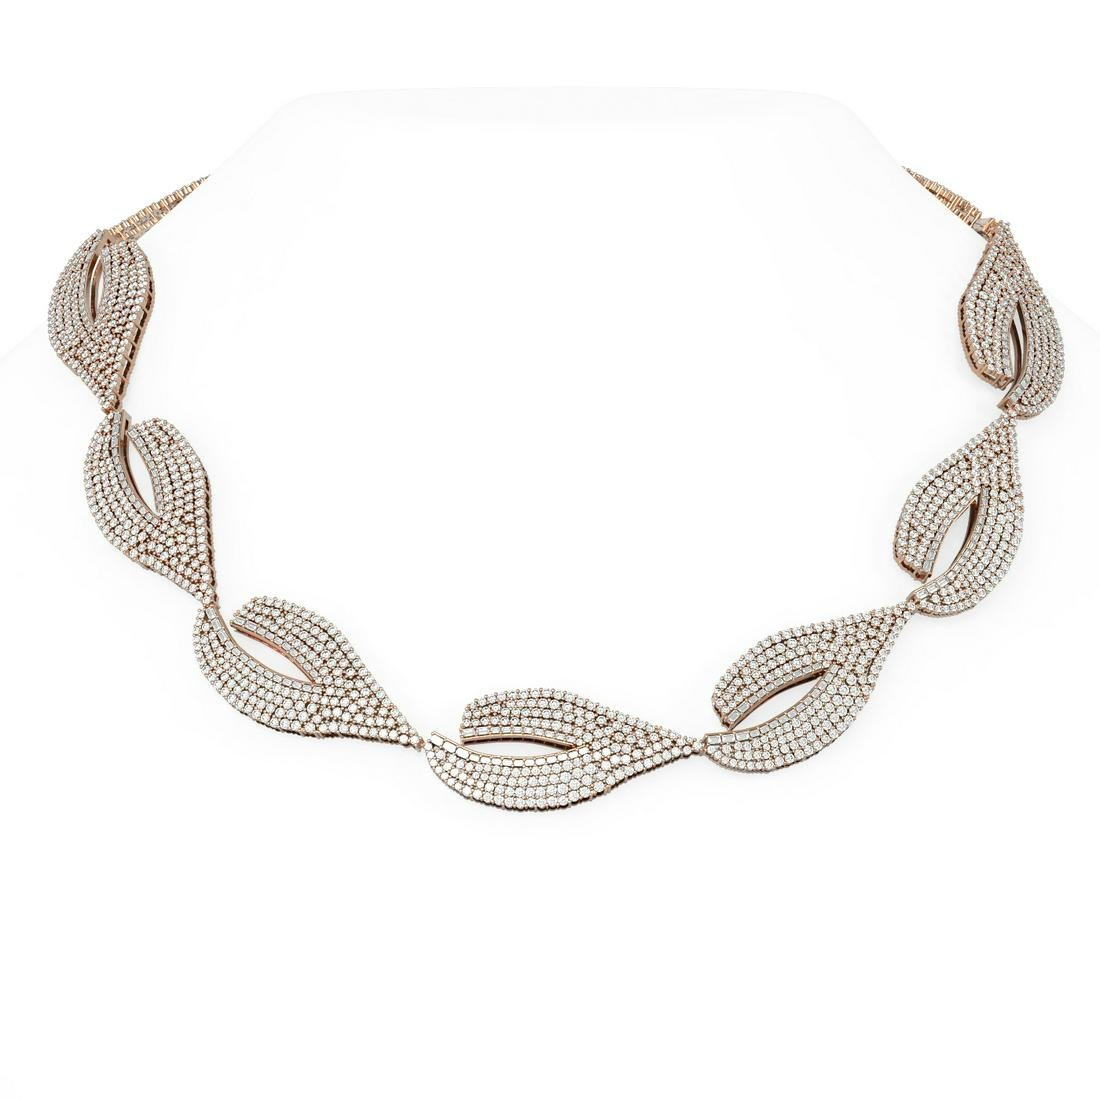 37 ctw Diamond Necklace 18K Rose Gold - REF-2904H9R